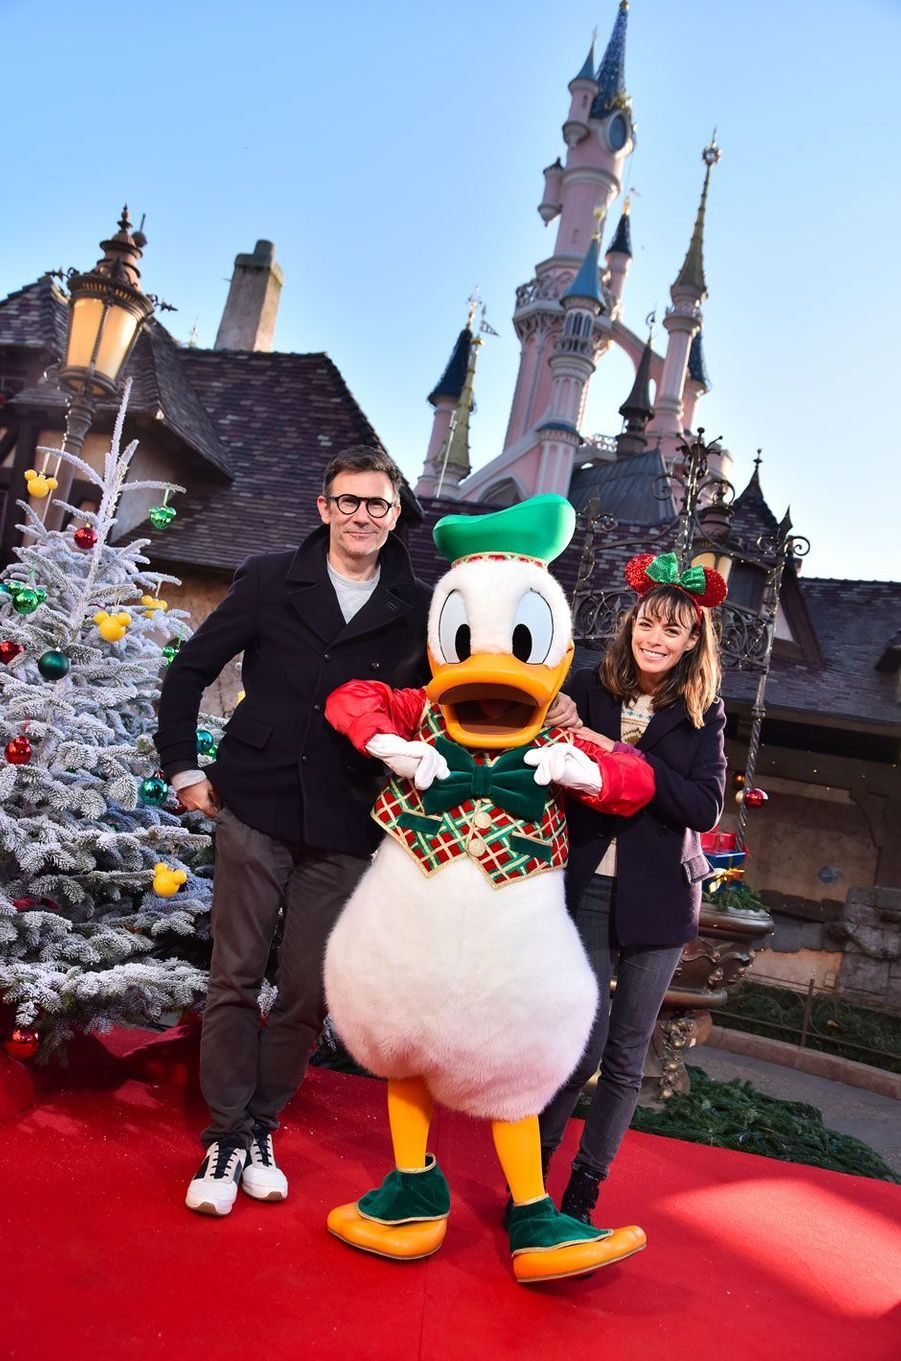 Berenice Bejo et Michel Hazanaviciuscélèbrent Noël et les 90 ans de Mickey à Disneyland